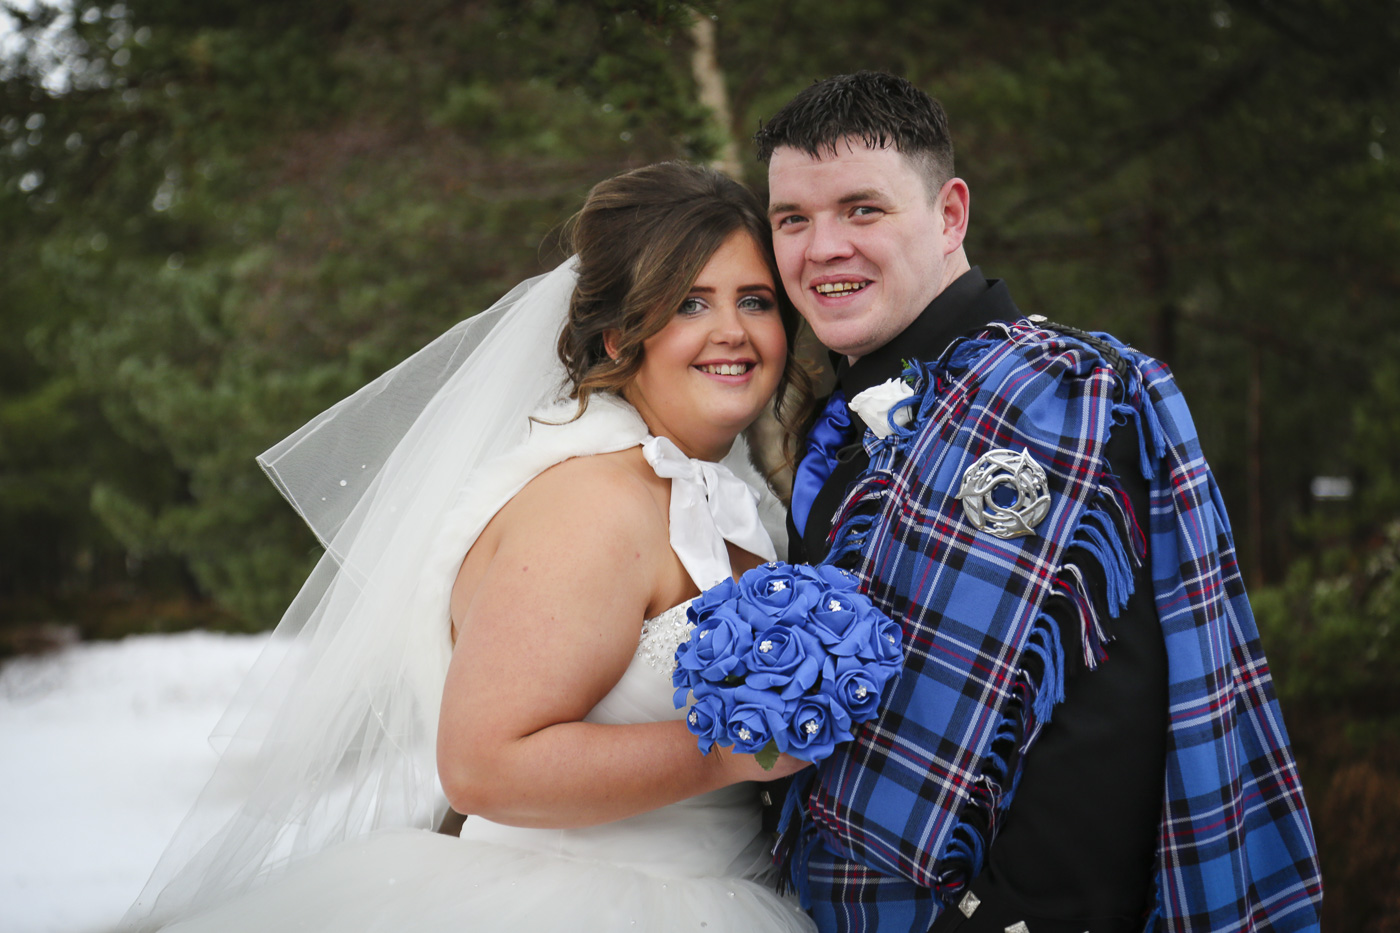 wedding-photography-at-the-hilton-coylumbridge-aviemore-8021